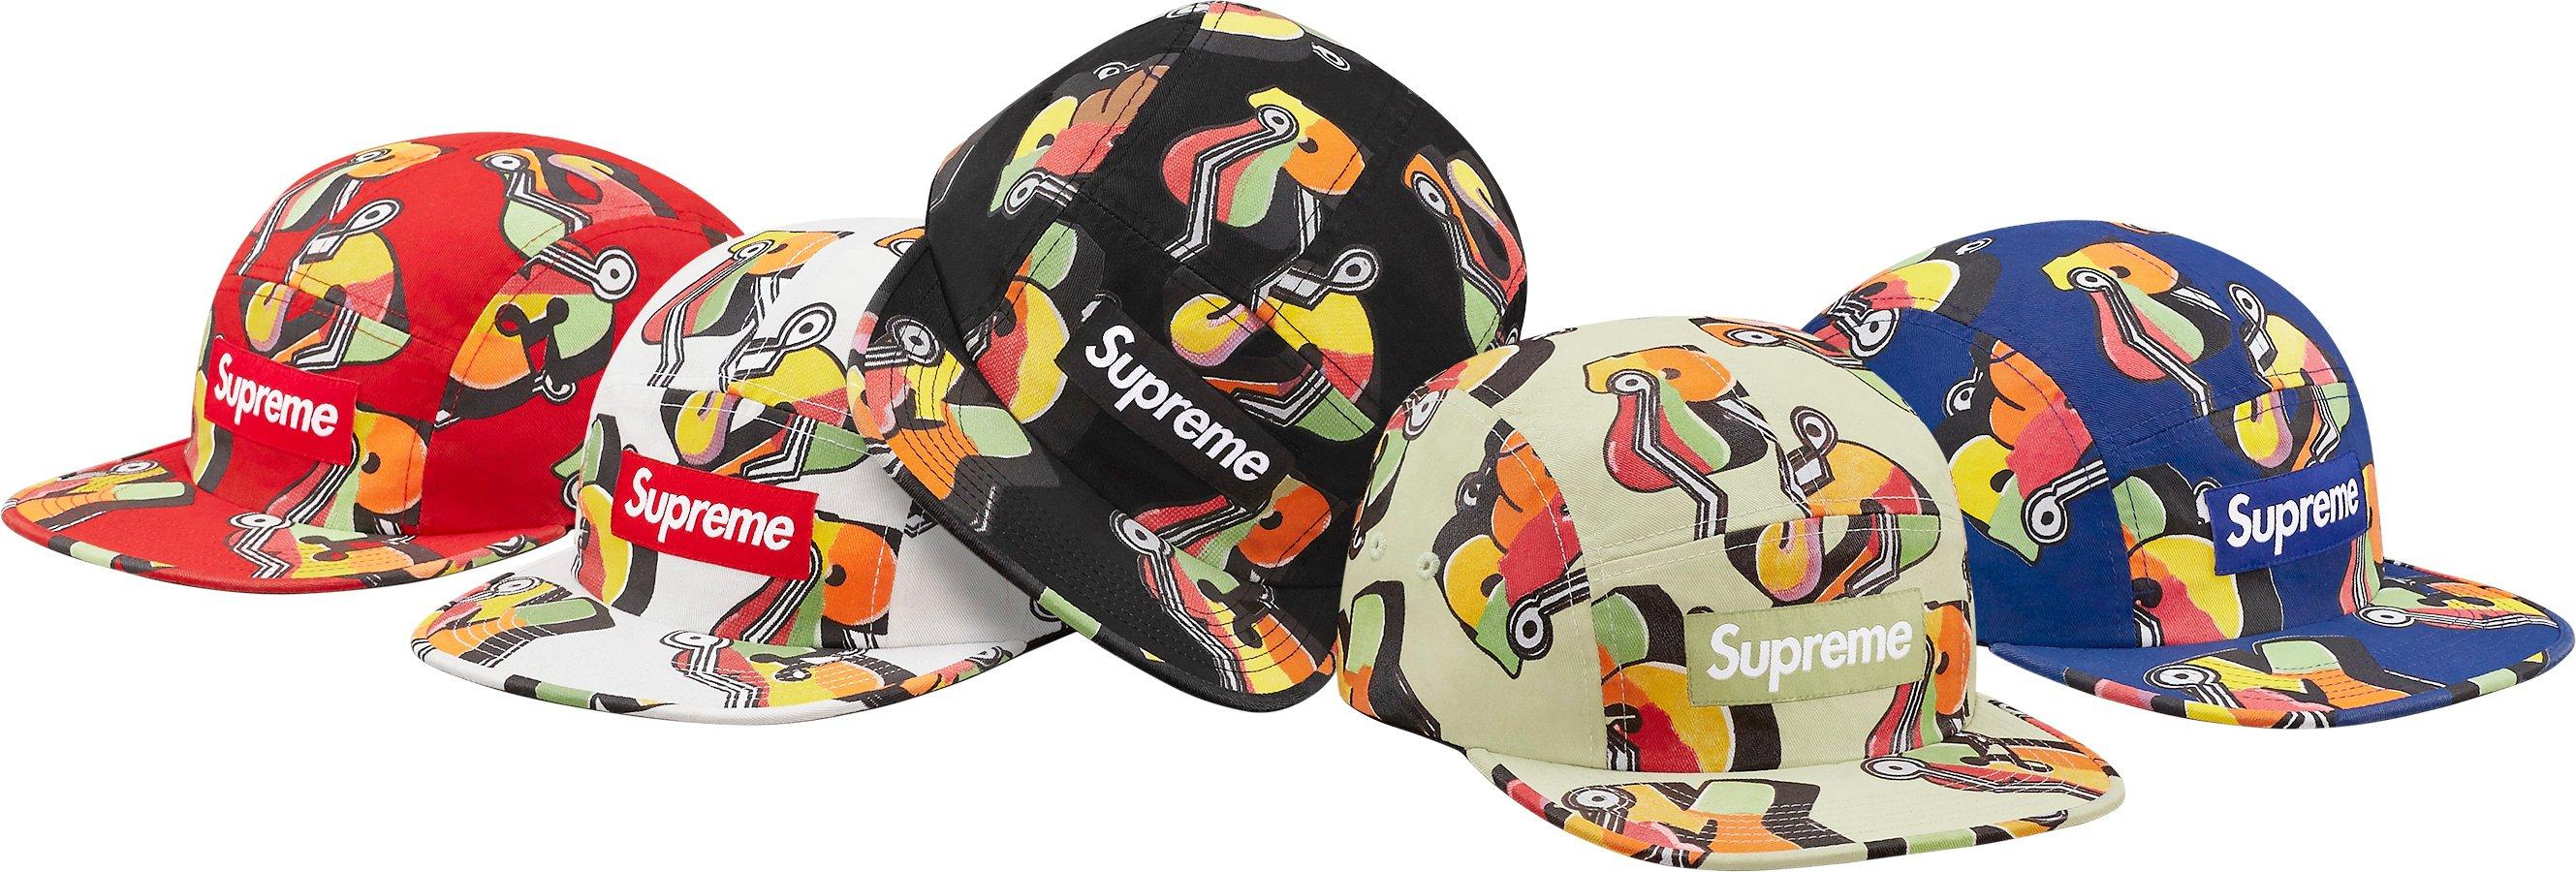 Cheap Wholesale Hats - Hat HD Image Ukjugs.Org 0b918a64512